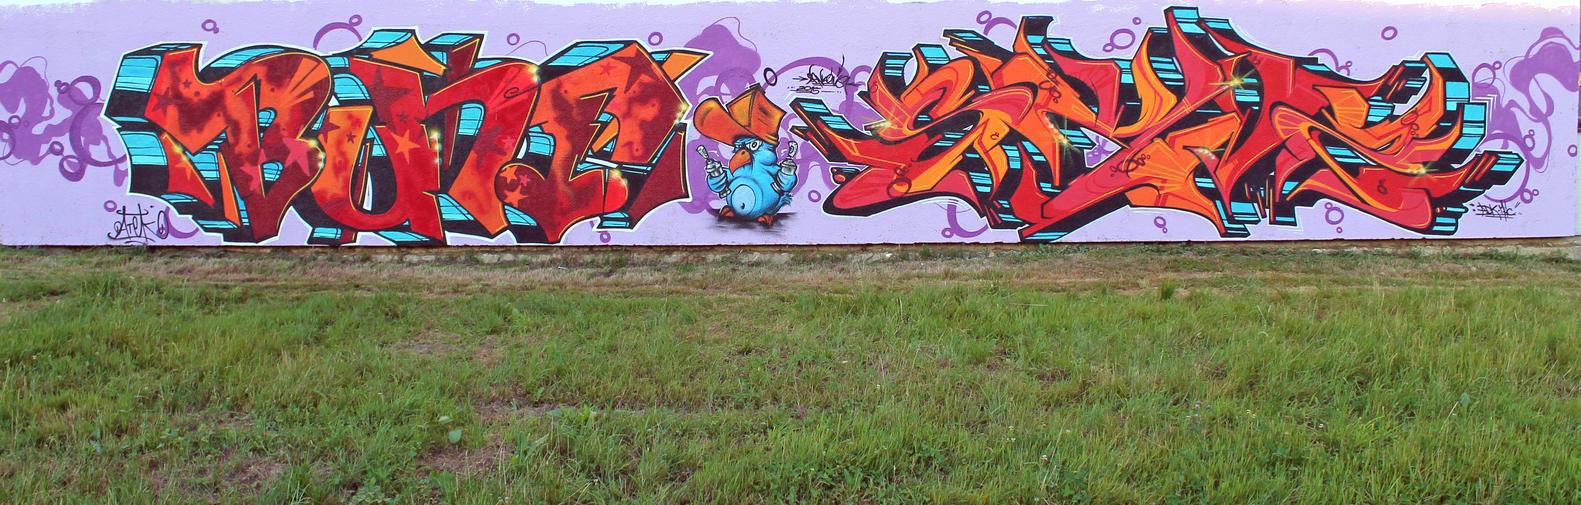 BUNT (ATEK) and SANZ Kutina by SANS-01-2-MHC-BS